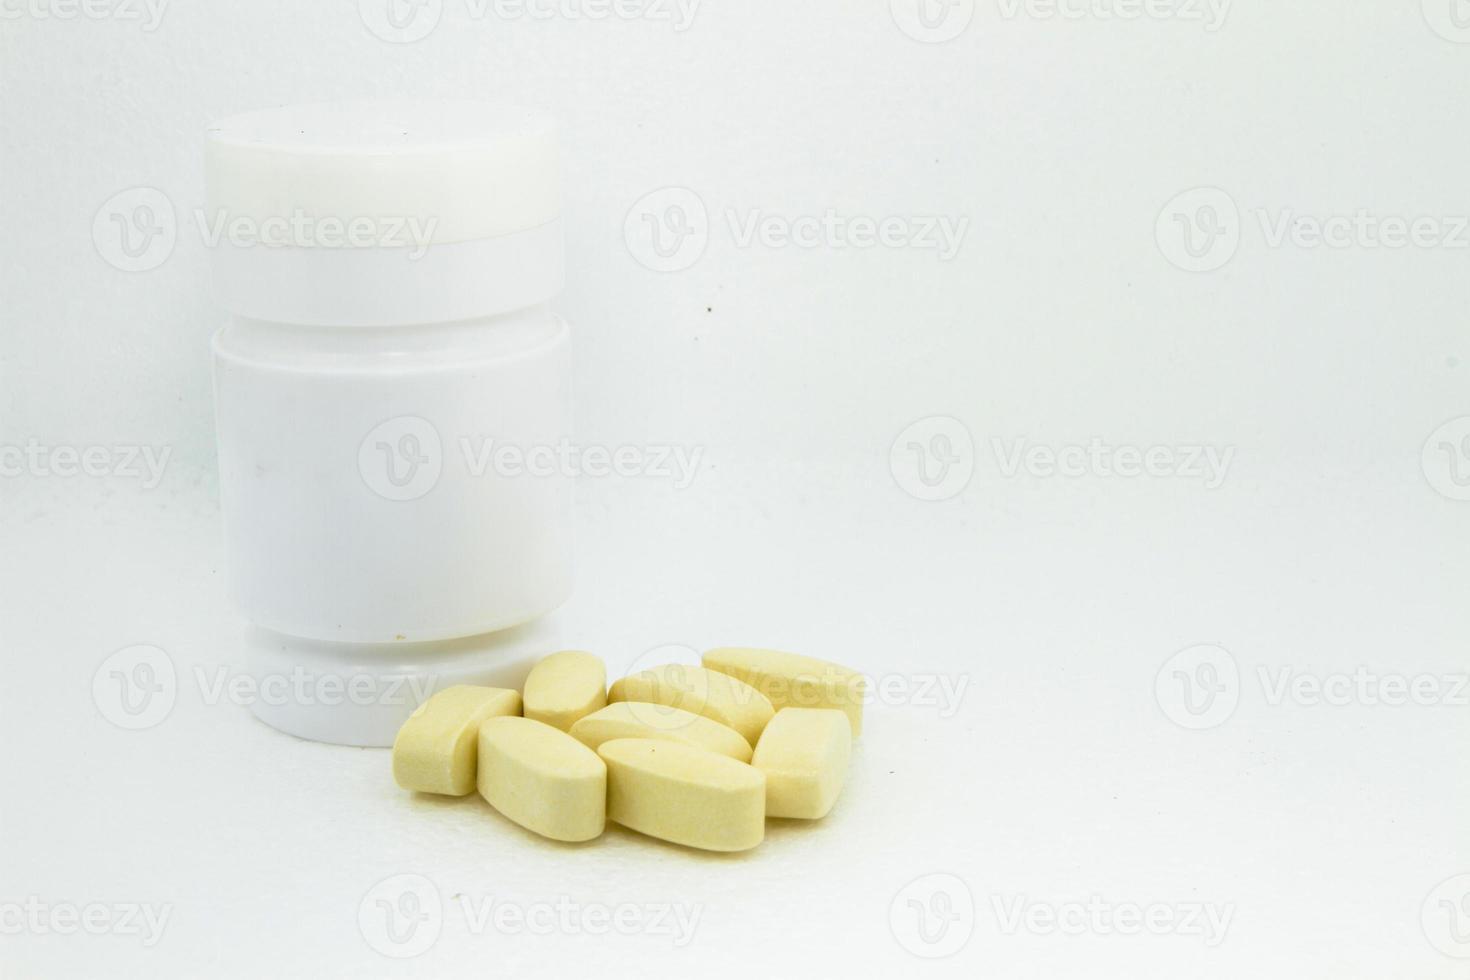 medicina gialla foto